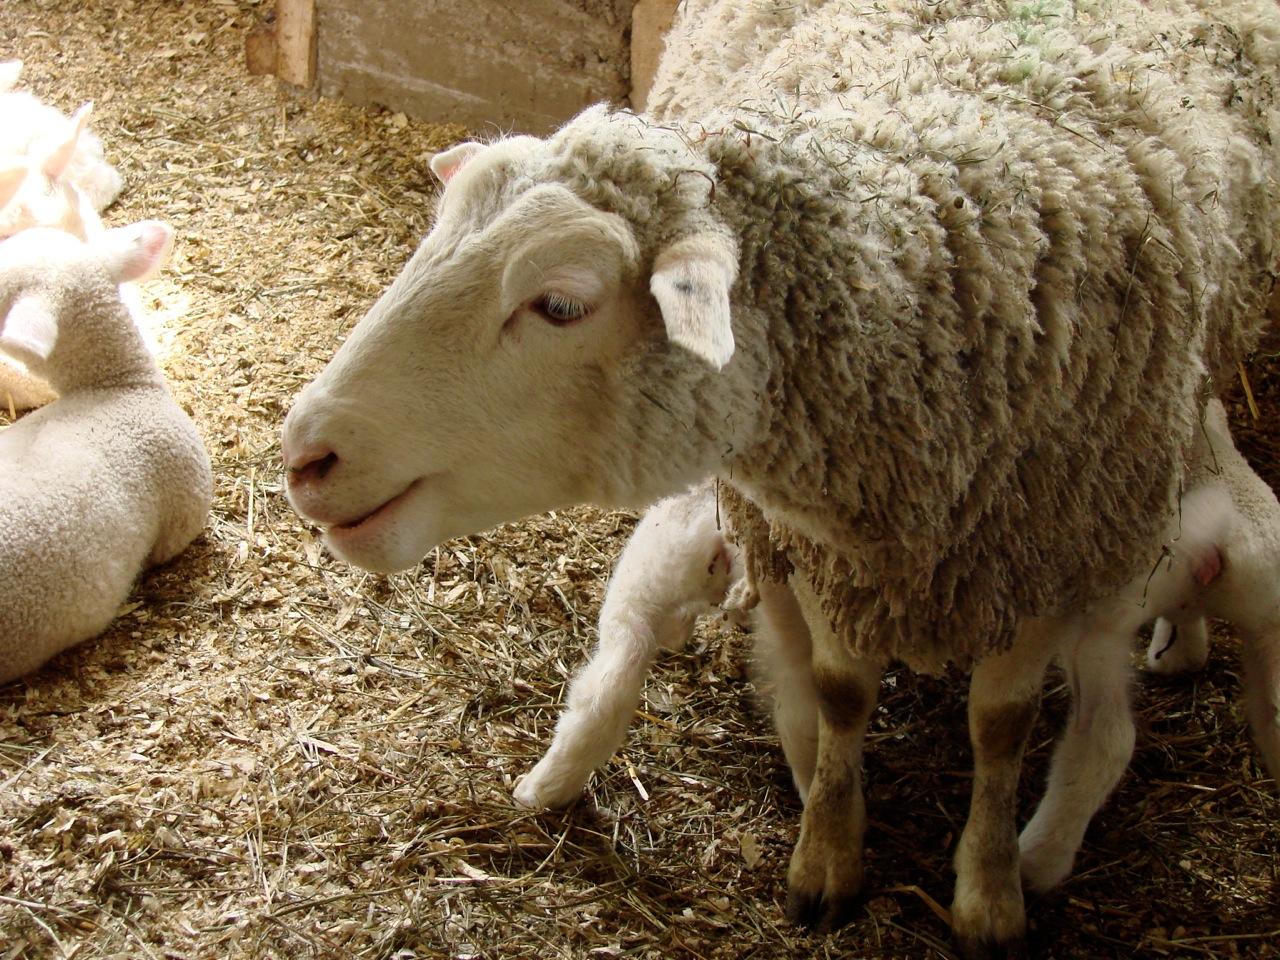 Spring Lambs Sleeping in Thick Wool